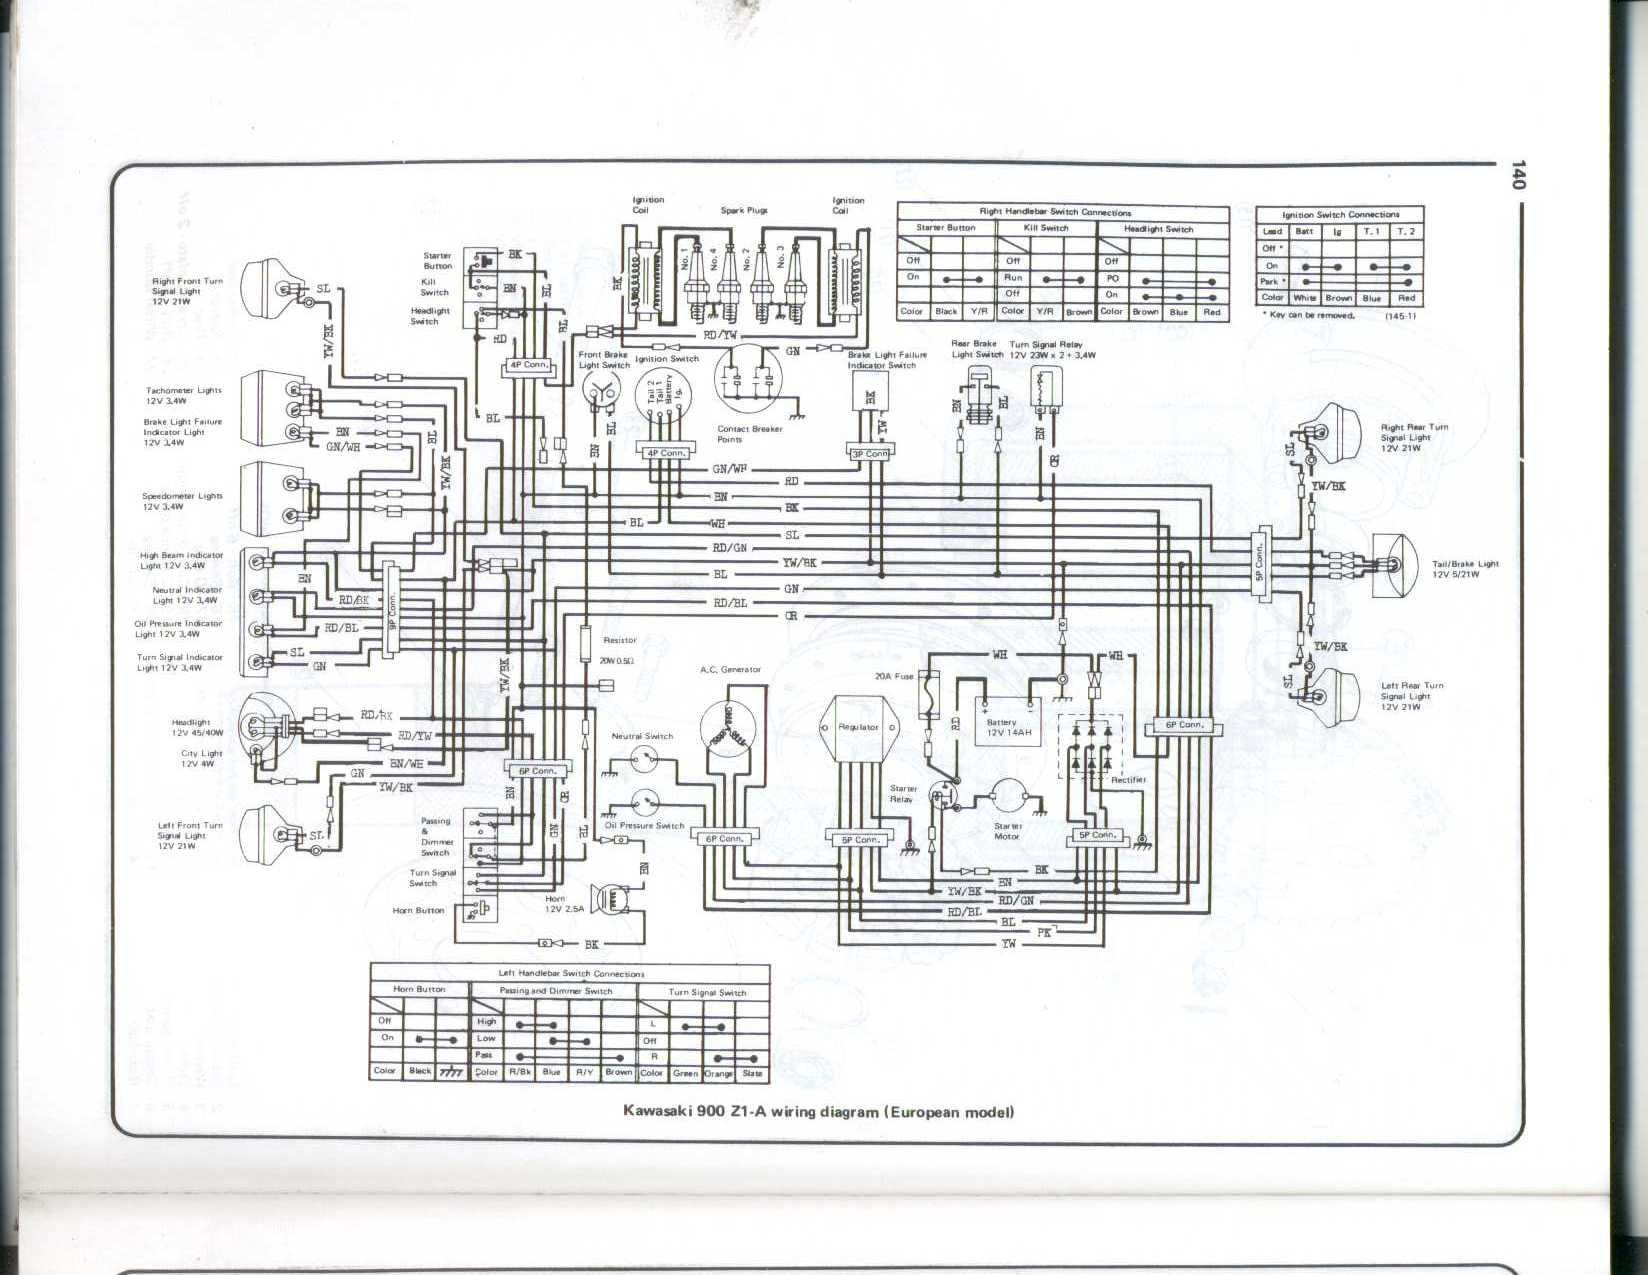 For John Deere 2020 Wiring Diagram Wiring Diagram For John